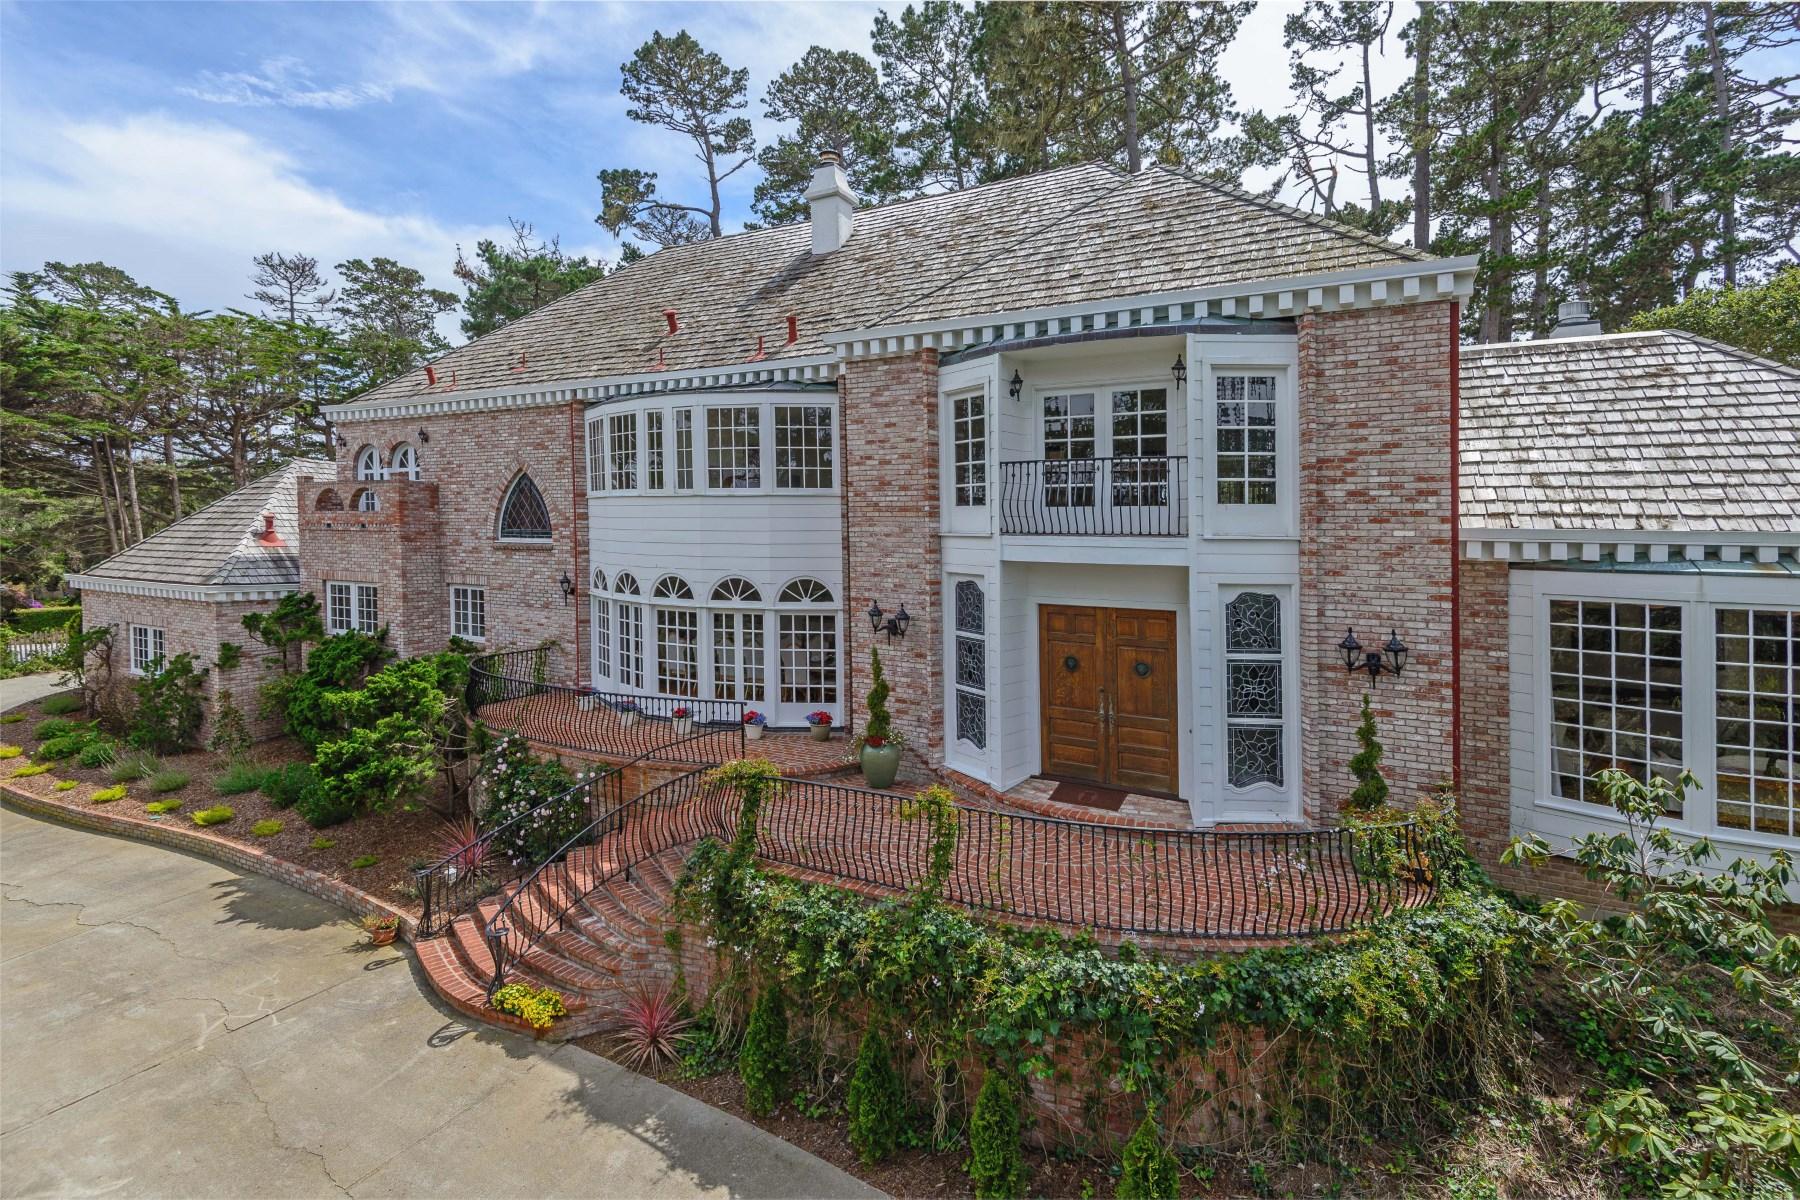 Single Family Home for Sale at Carnoustie Manor in Pebble Beach 1284 Portola Road Pebble Beach, California, 93953 United States